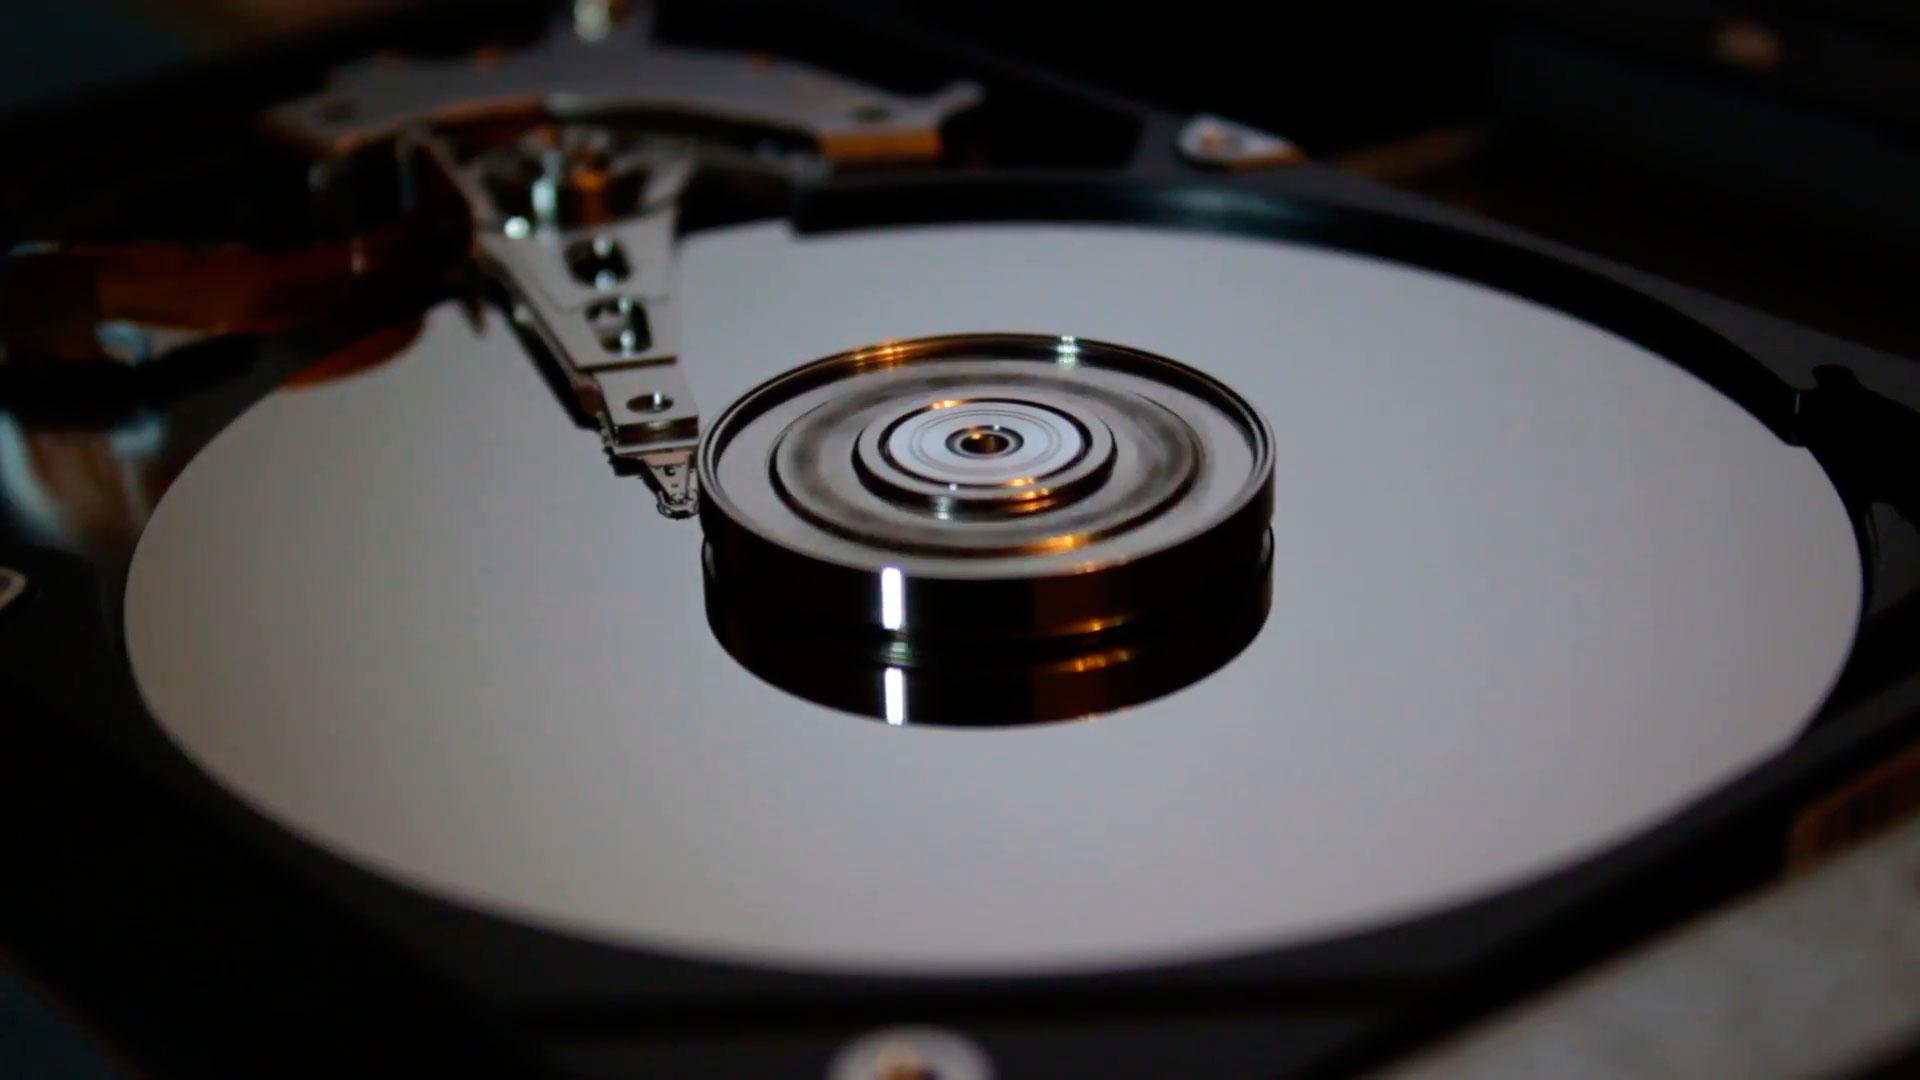 ontrack-recuperación de datos